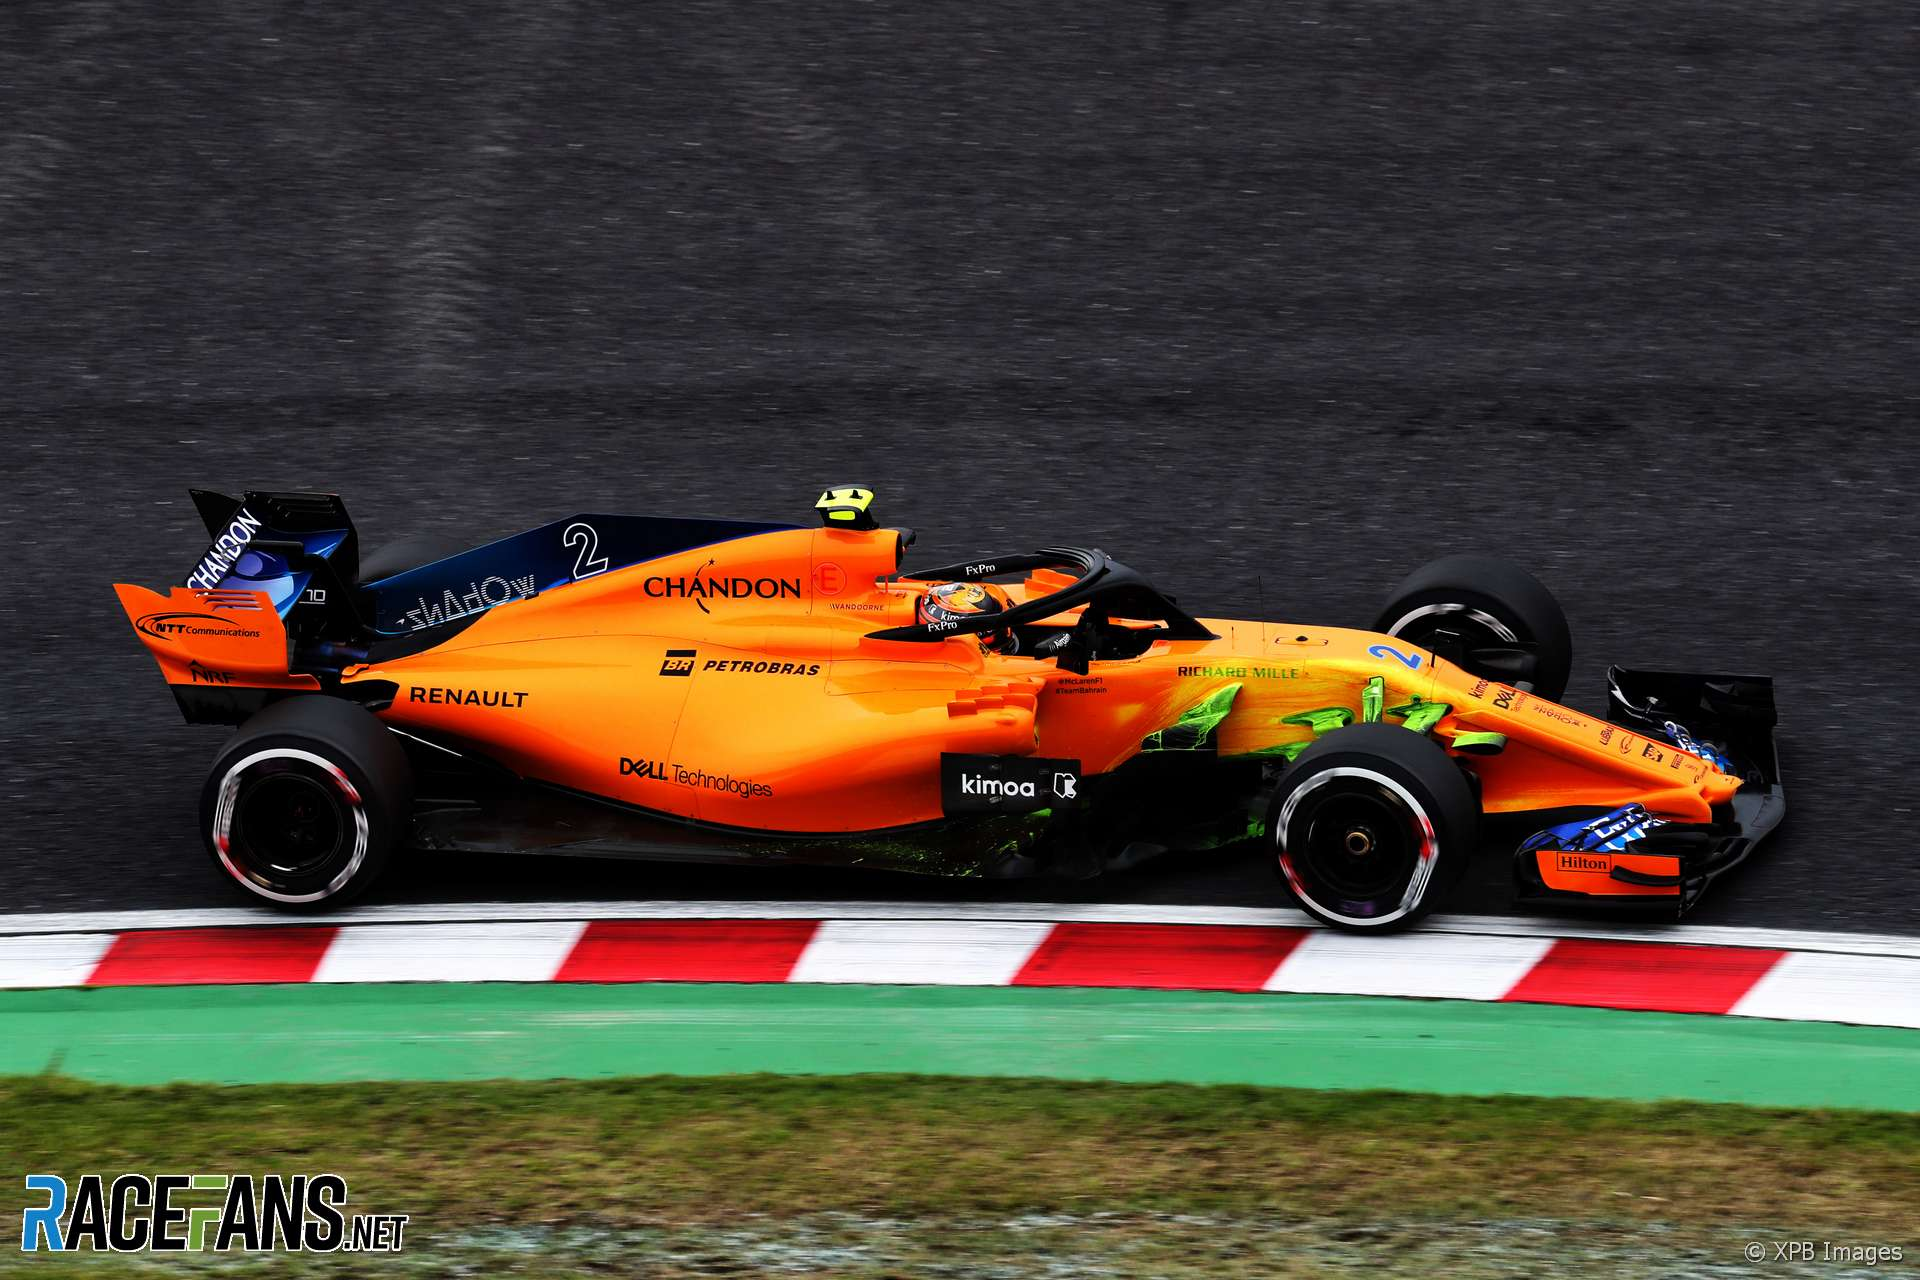 Stoffel Vandoorne, McLaren, Suzuka, 2018